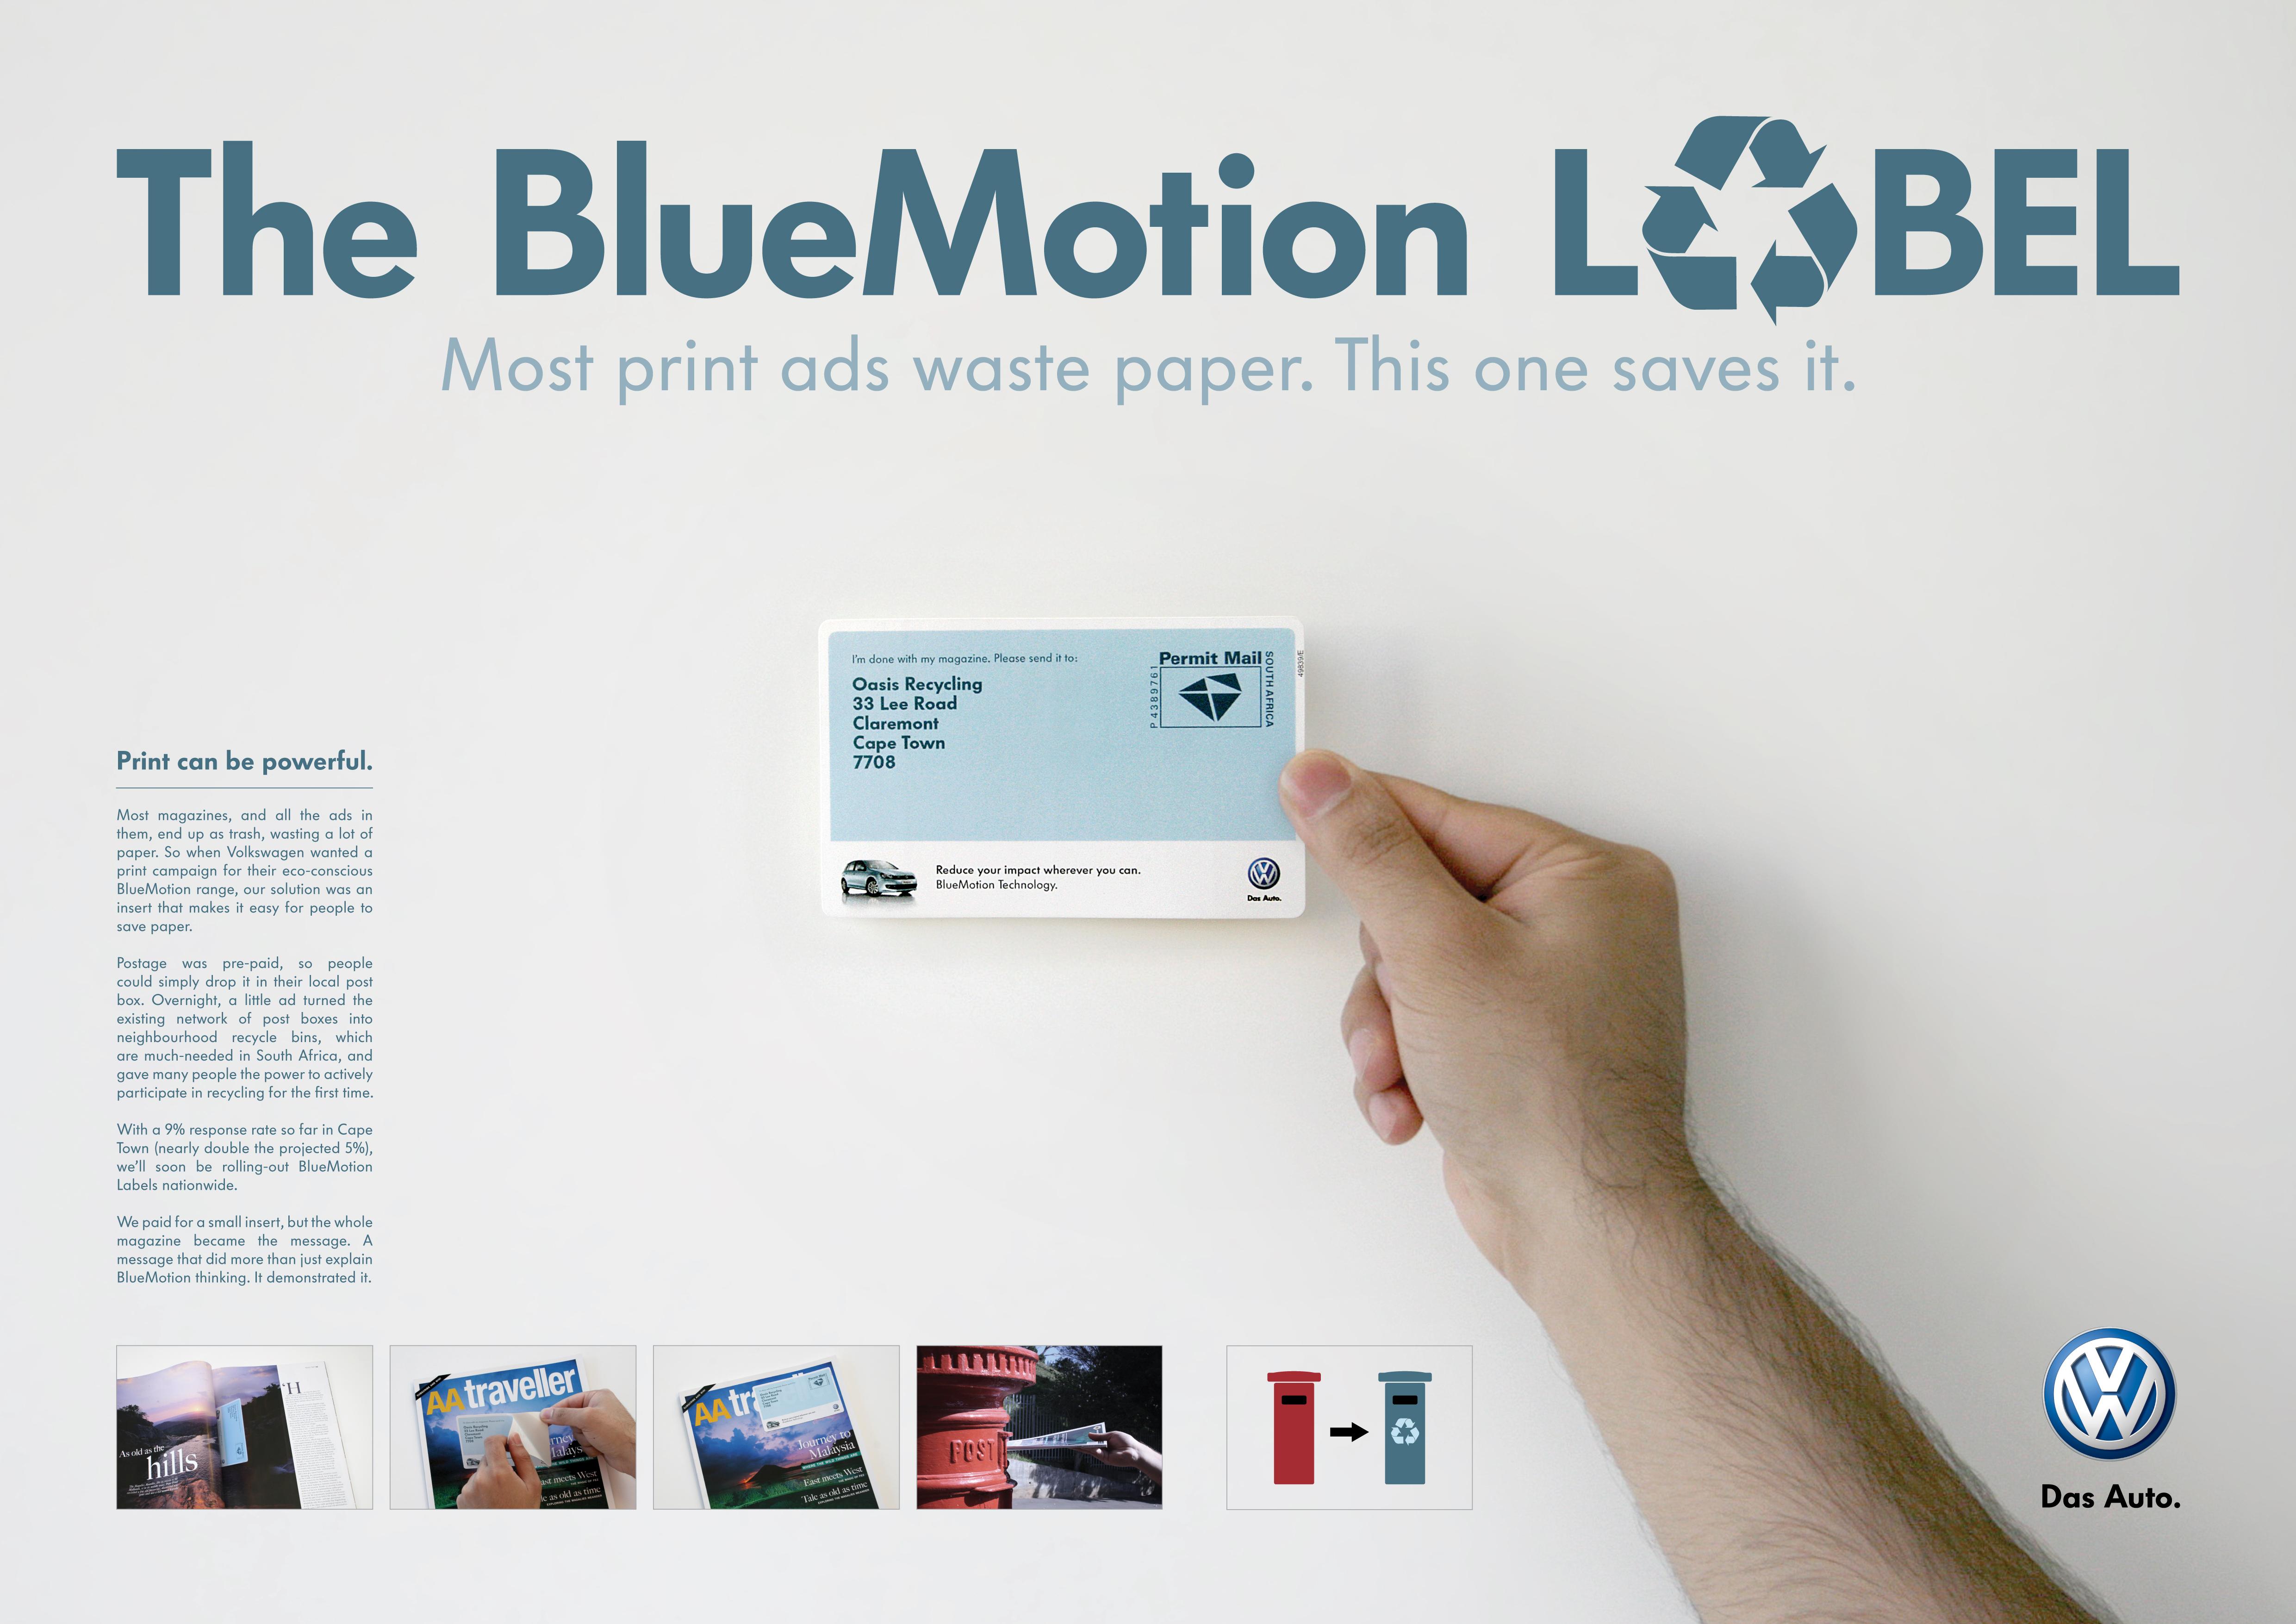 Bluemotion Label Direct_Promo_Media